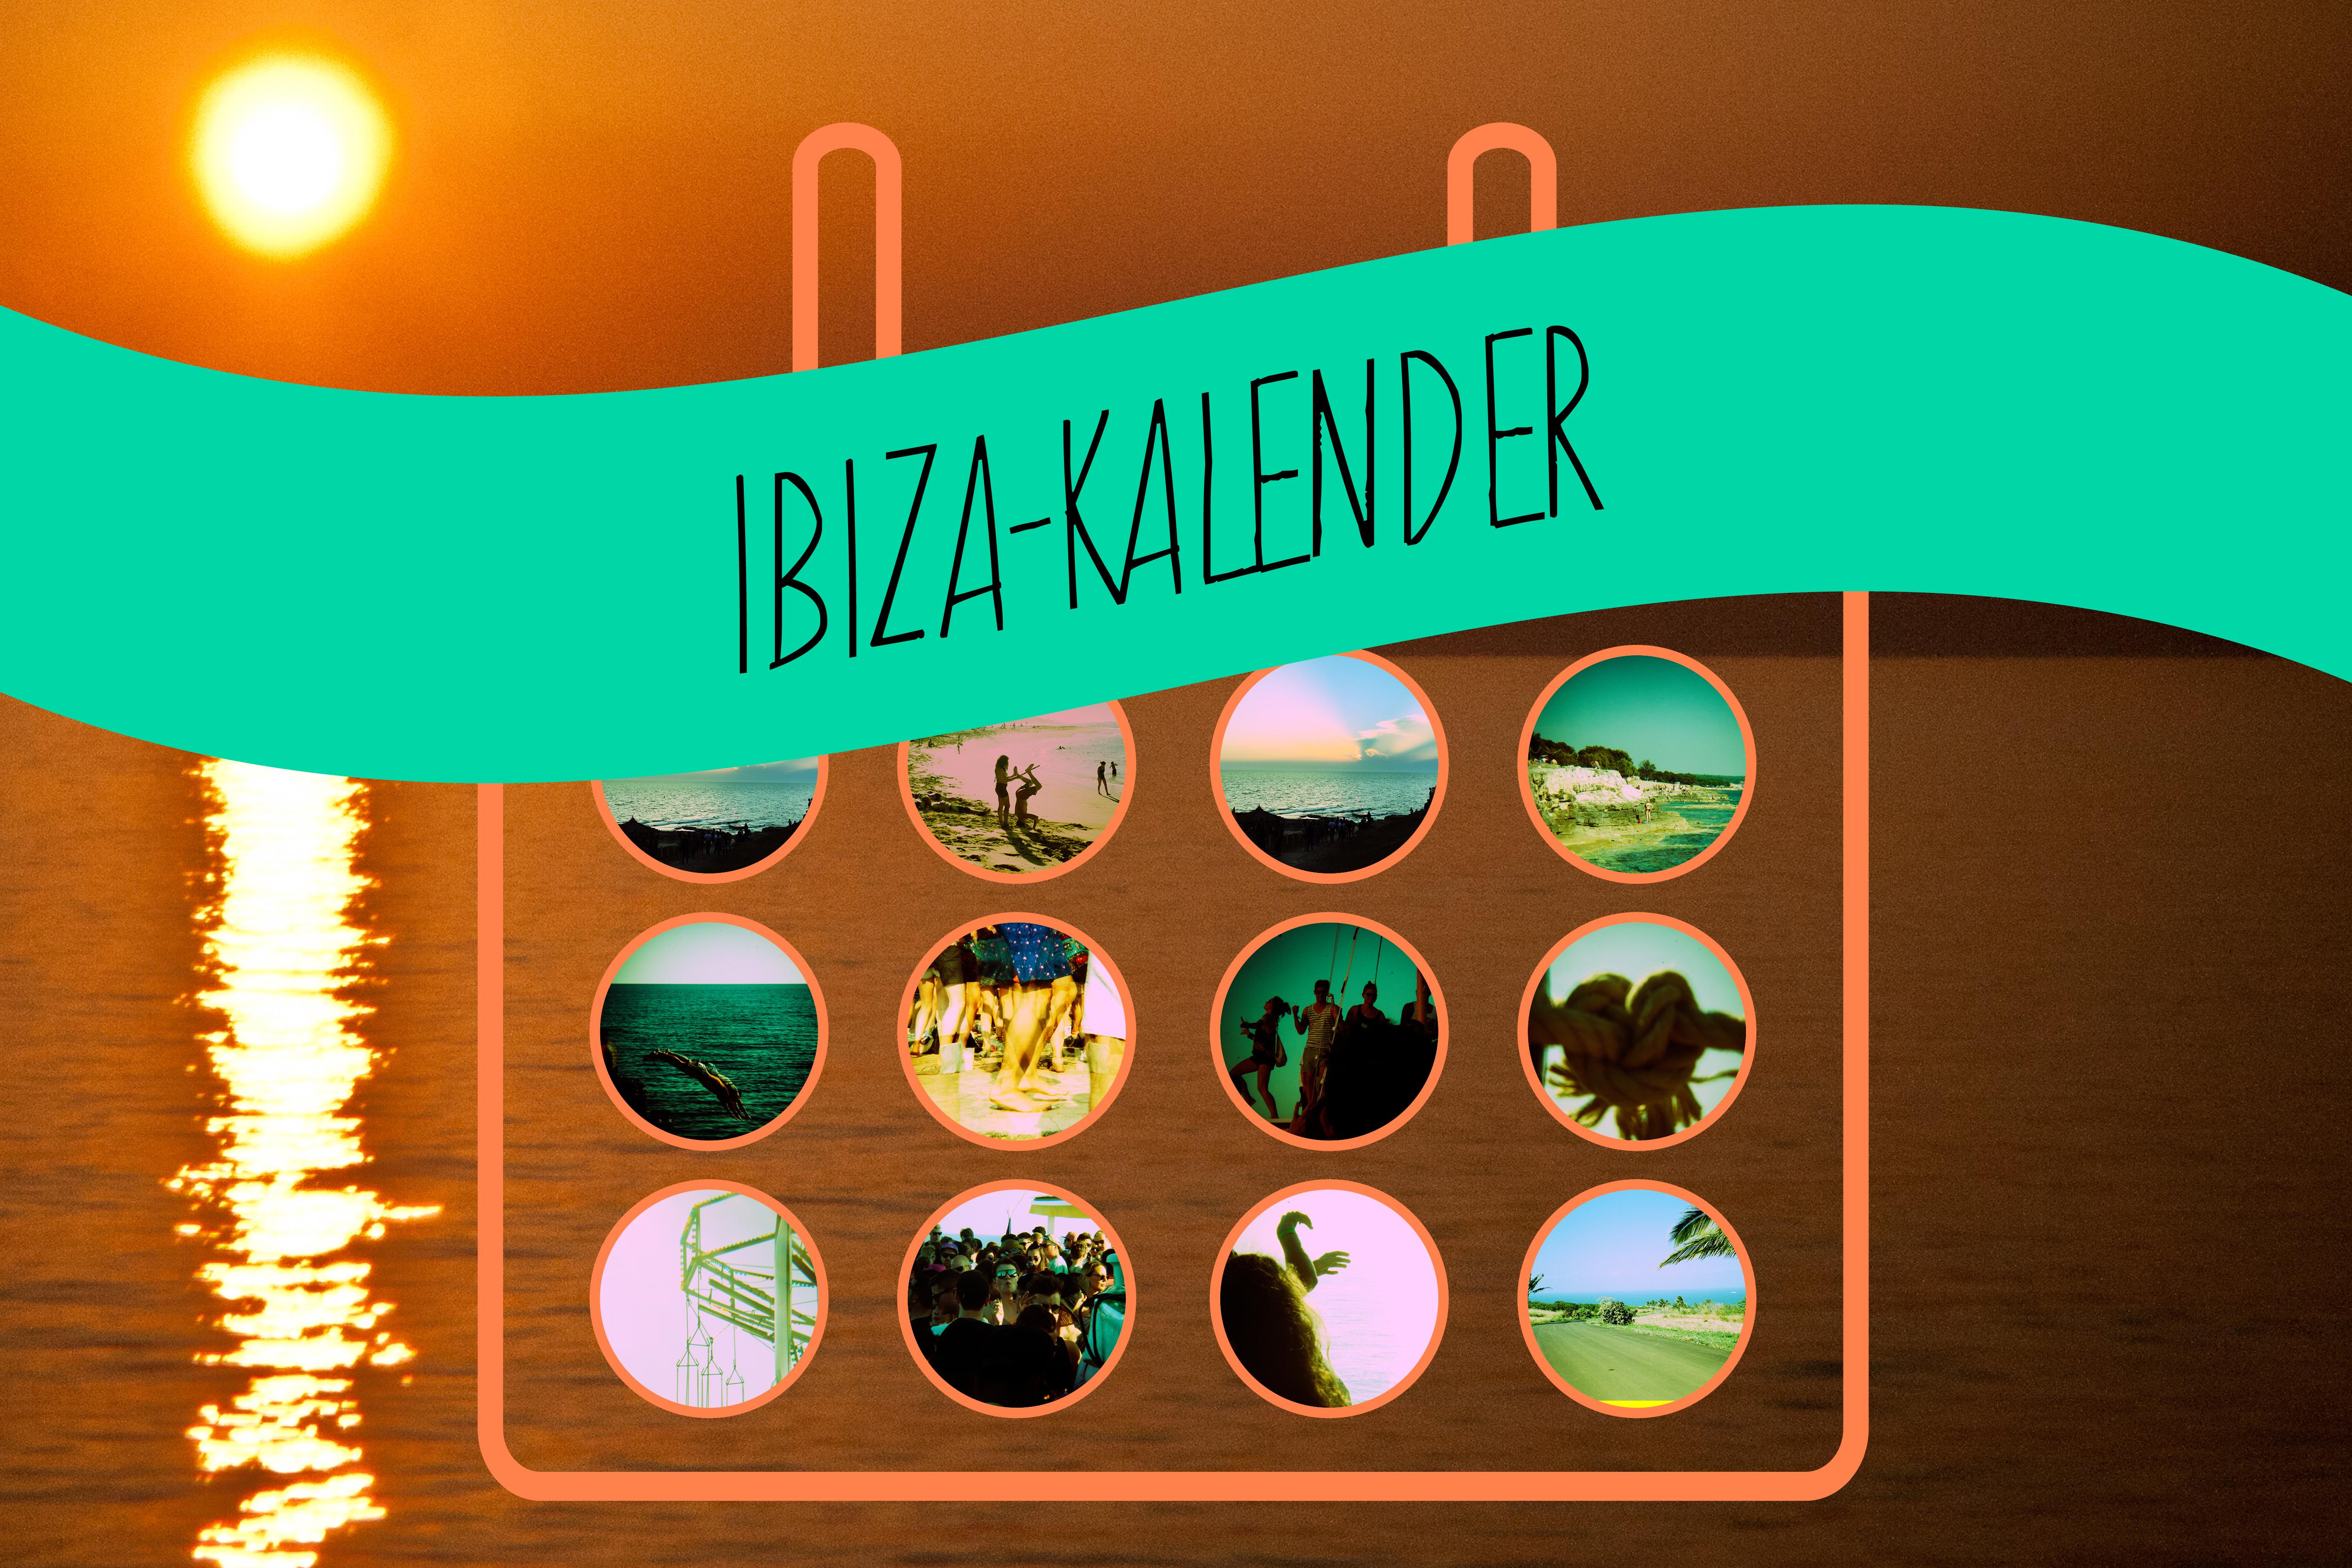 Ibiza-Kalender 2015